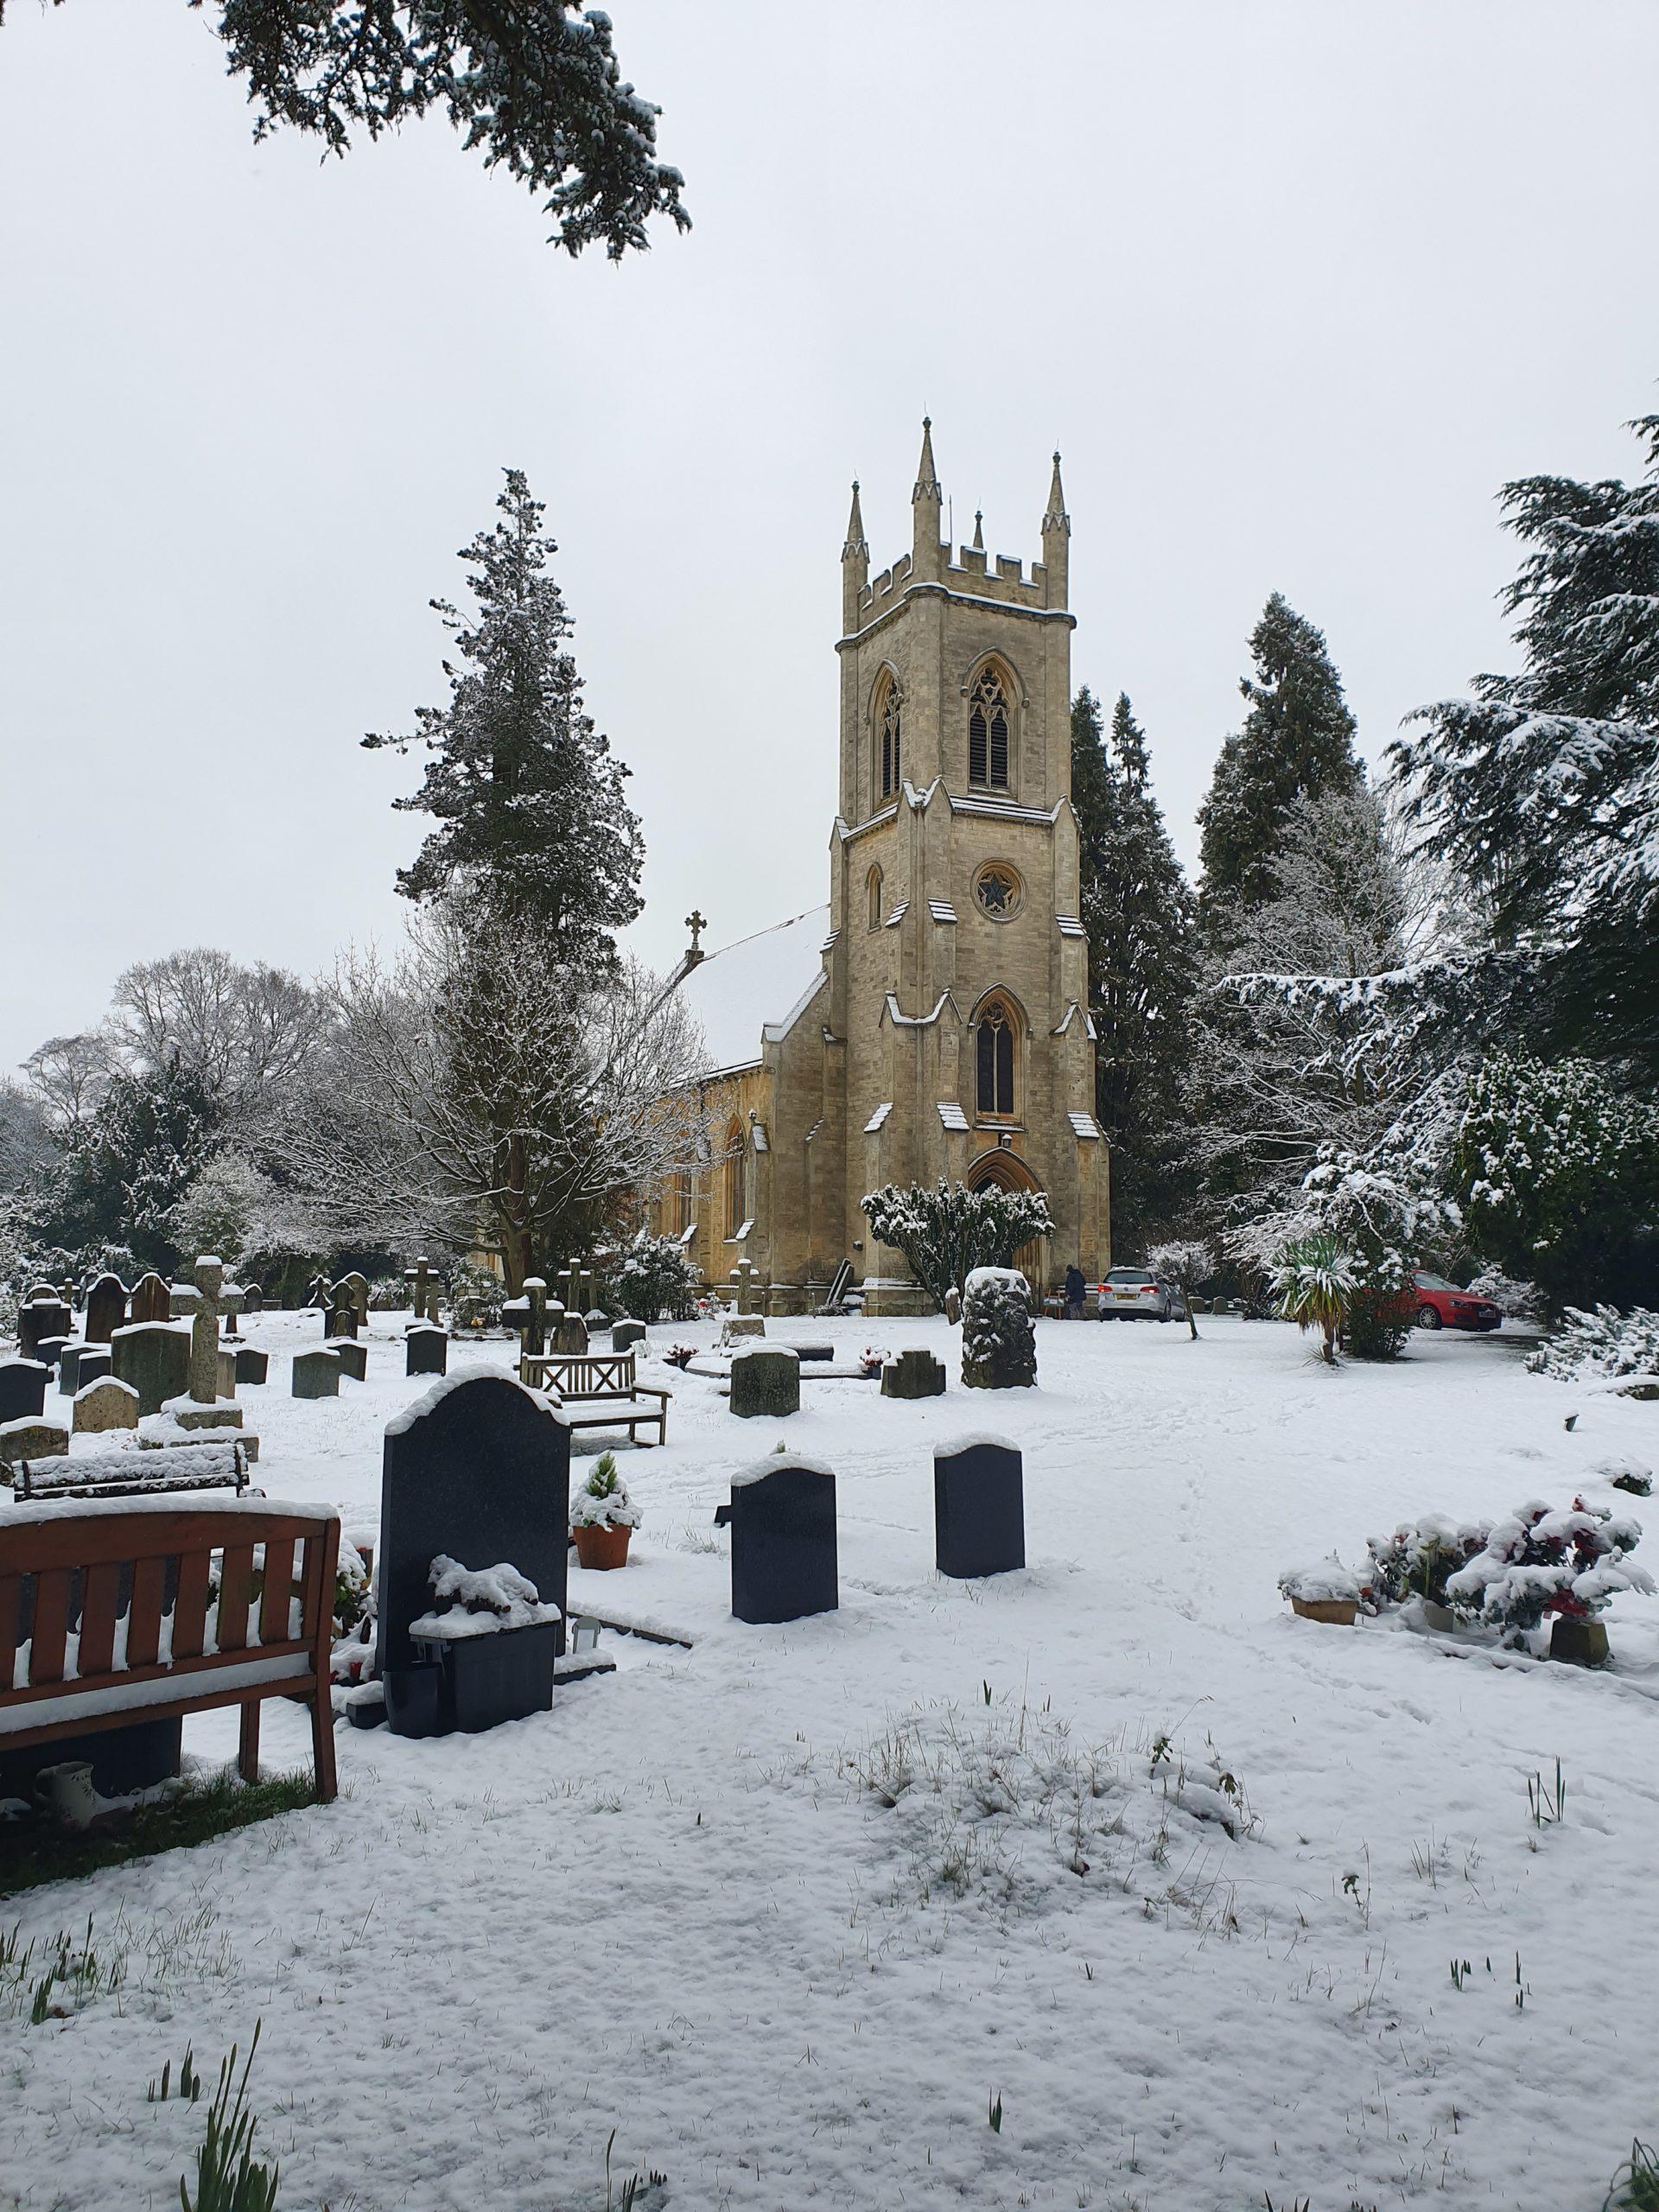 Snow at St. Catherine's Church, Sindlesham